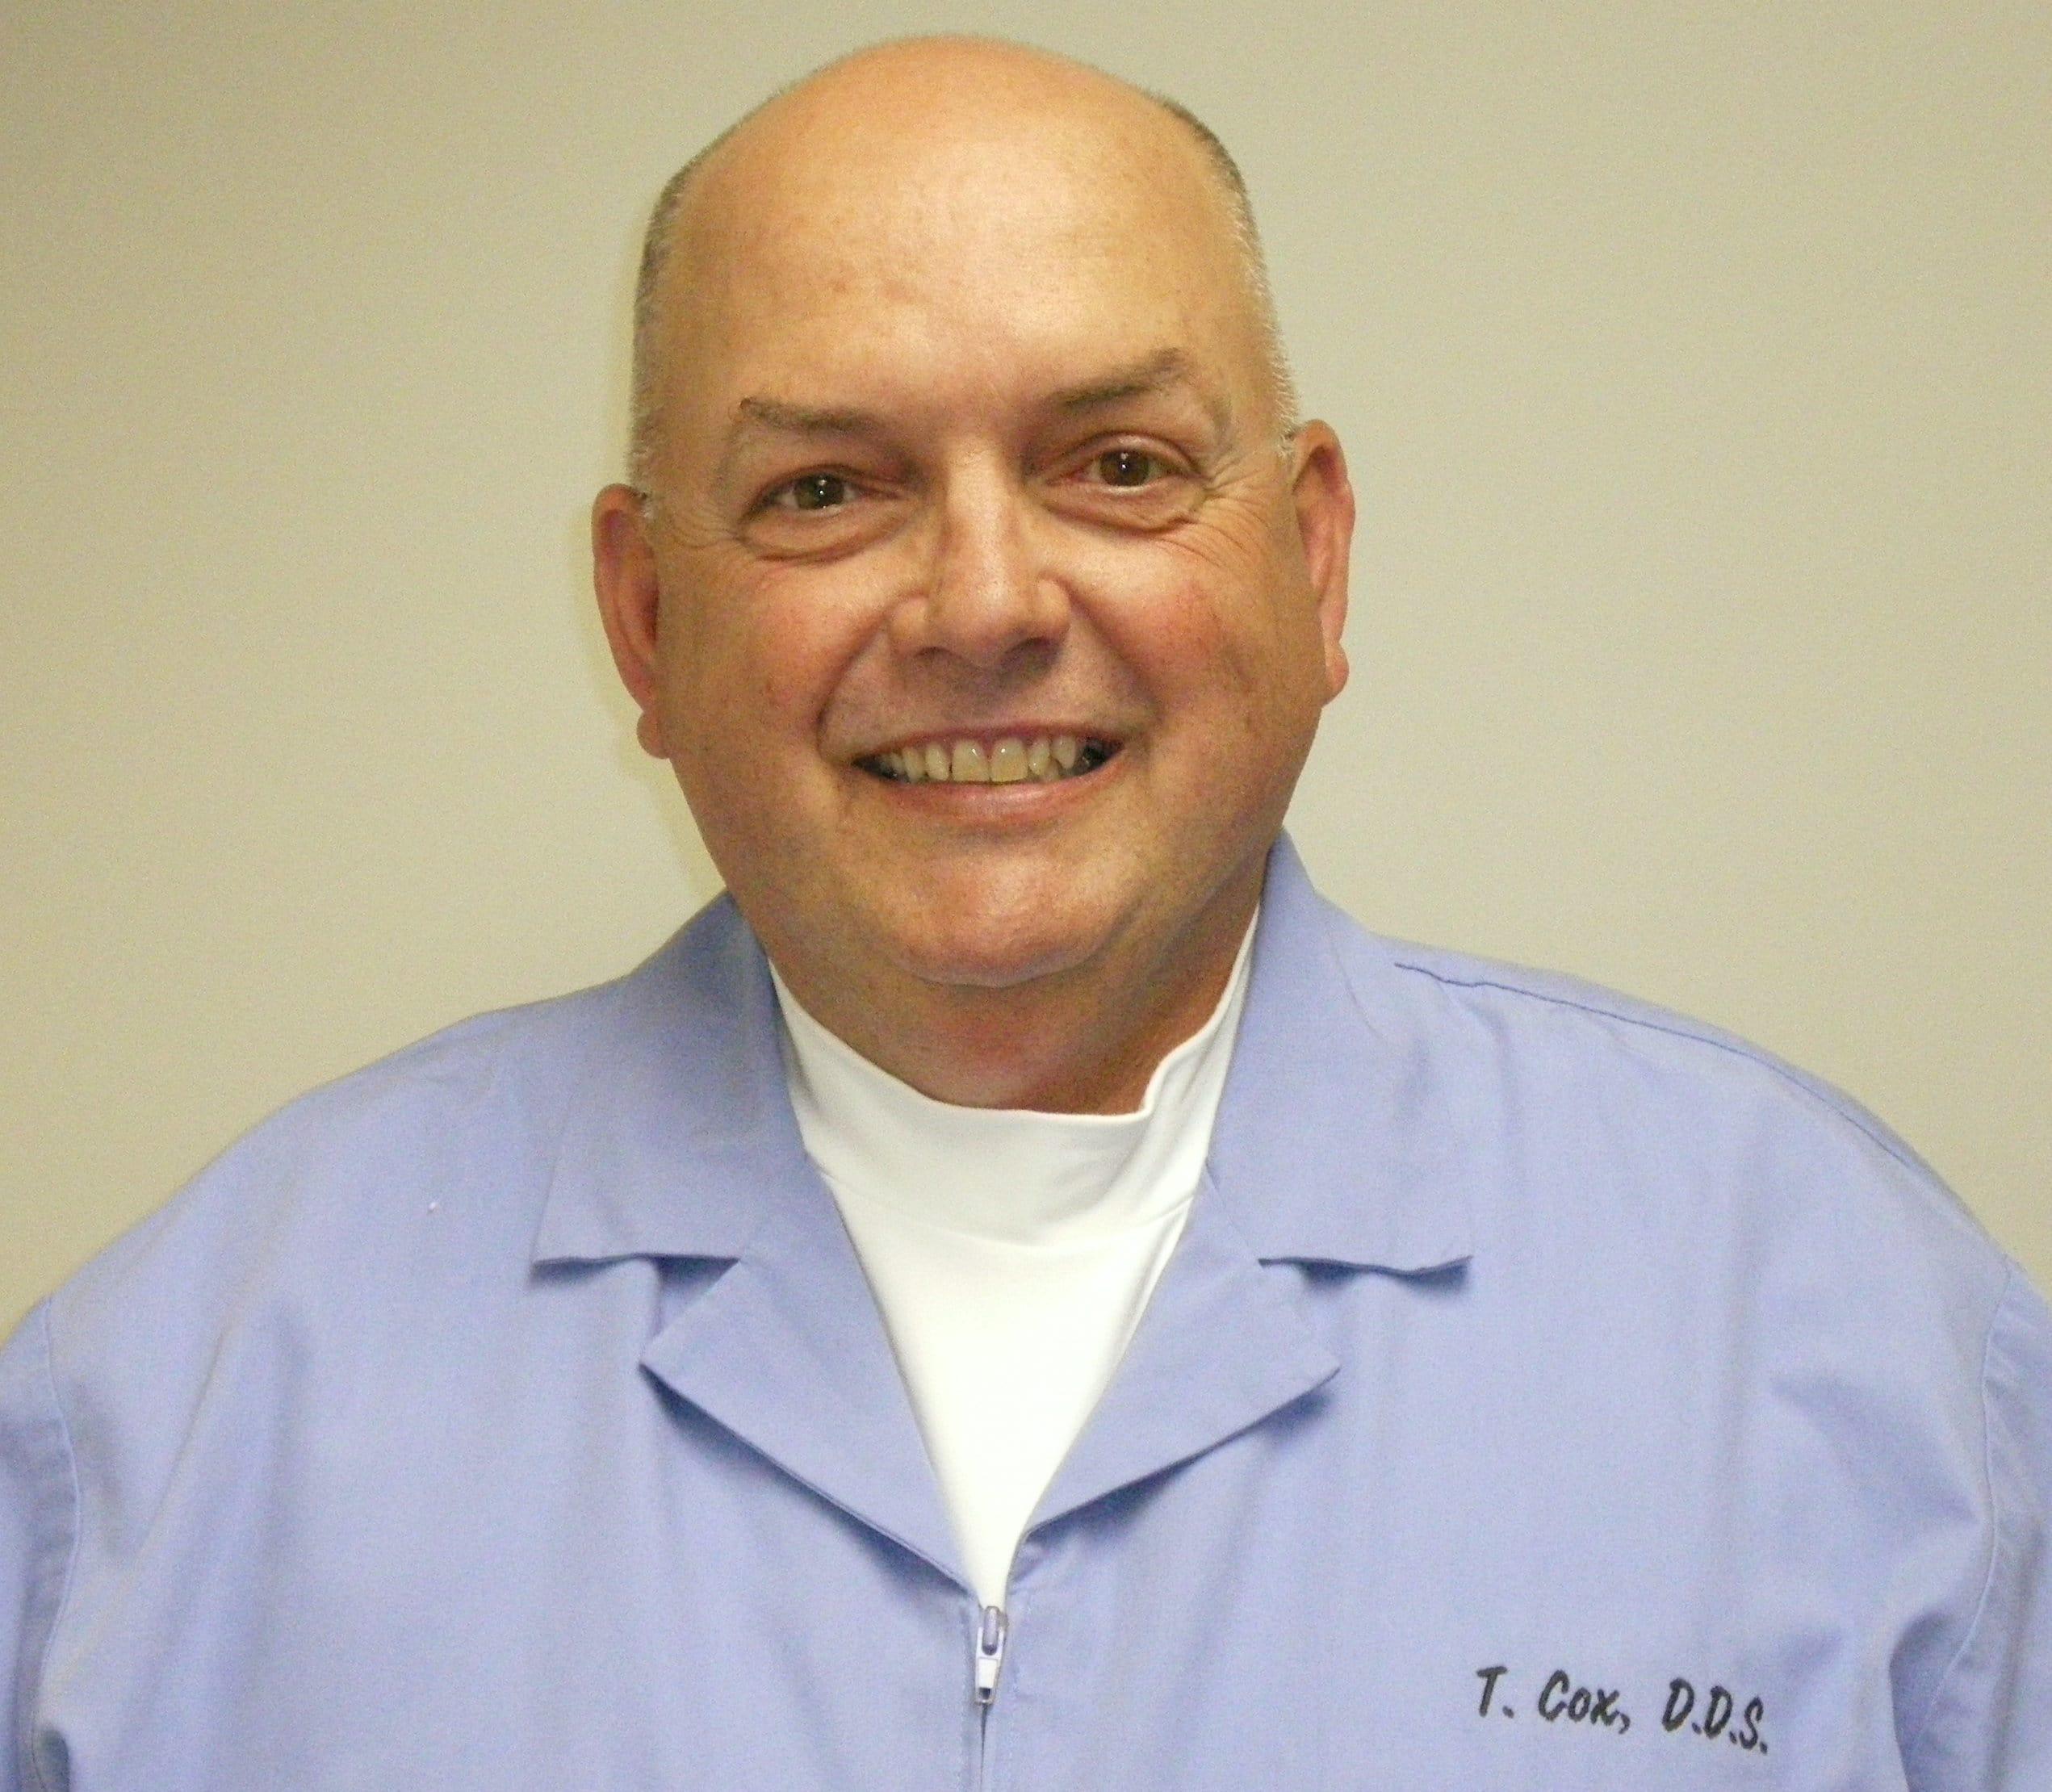 Timothy B Cox, DDS General Dentistry